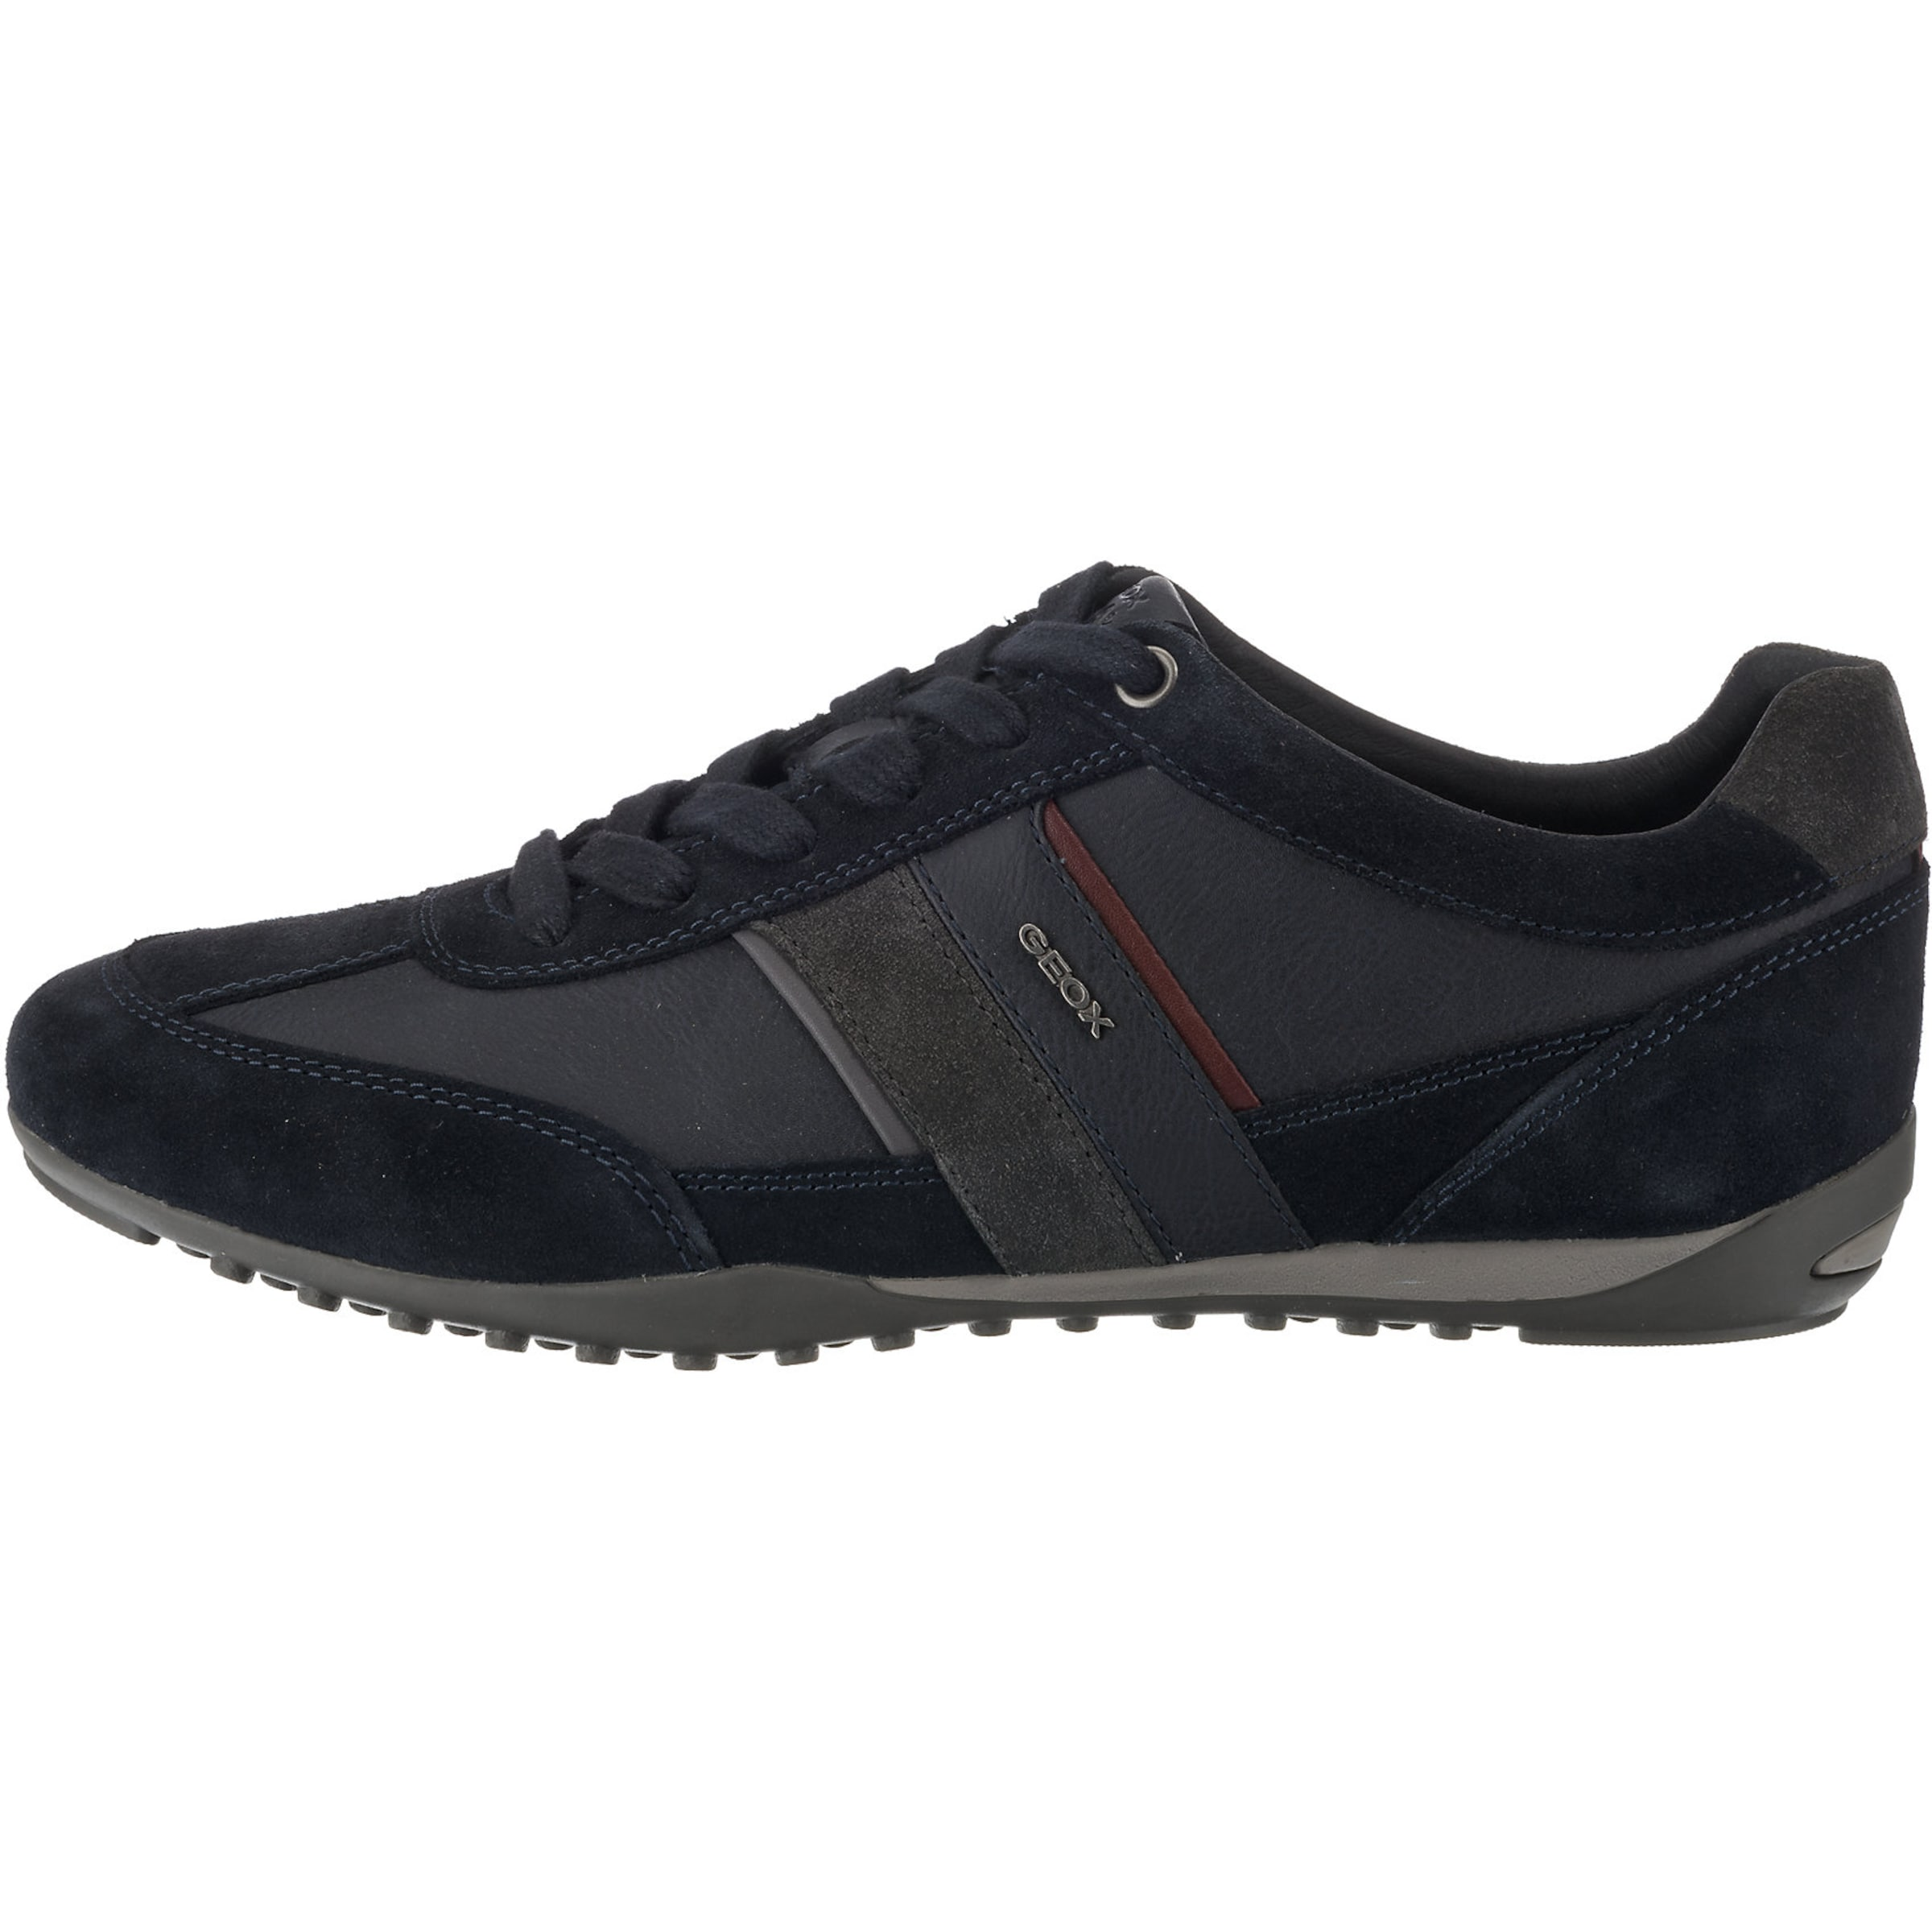 'u Geox Sneakers Wells In NachtblauSchwarz C' zMpGUVSq